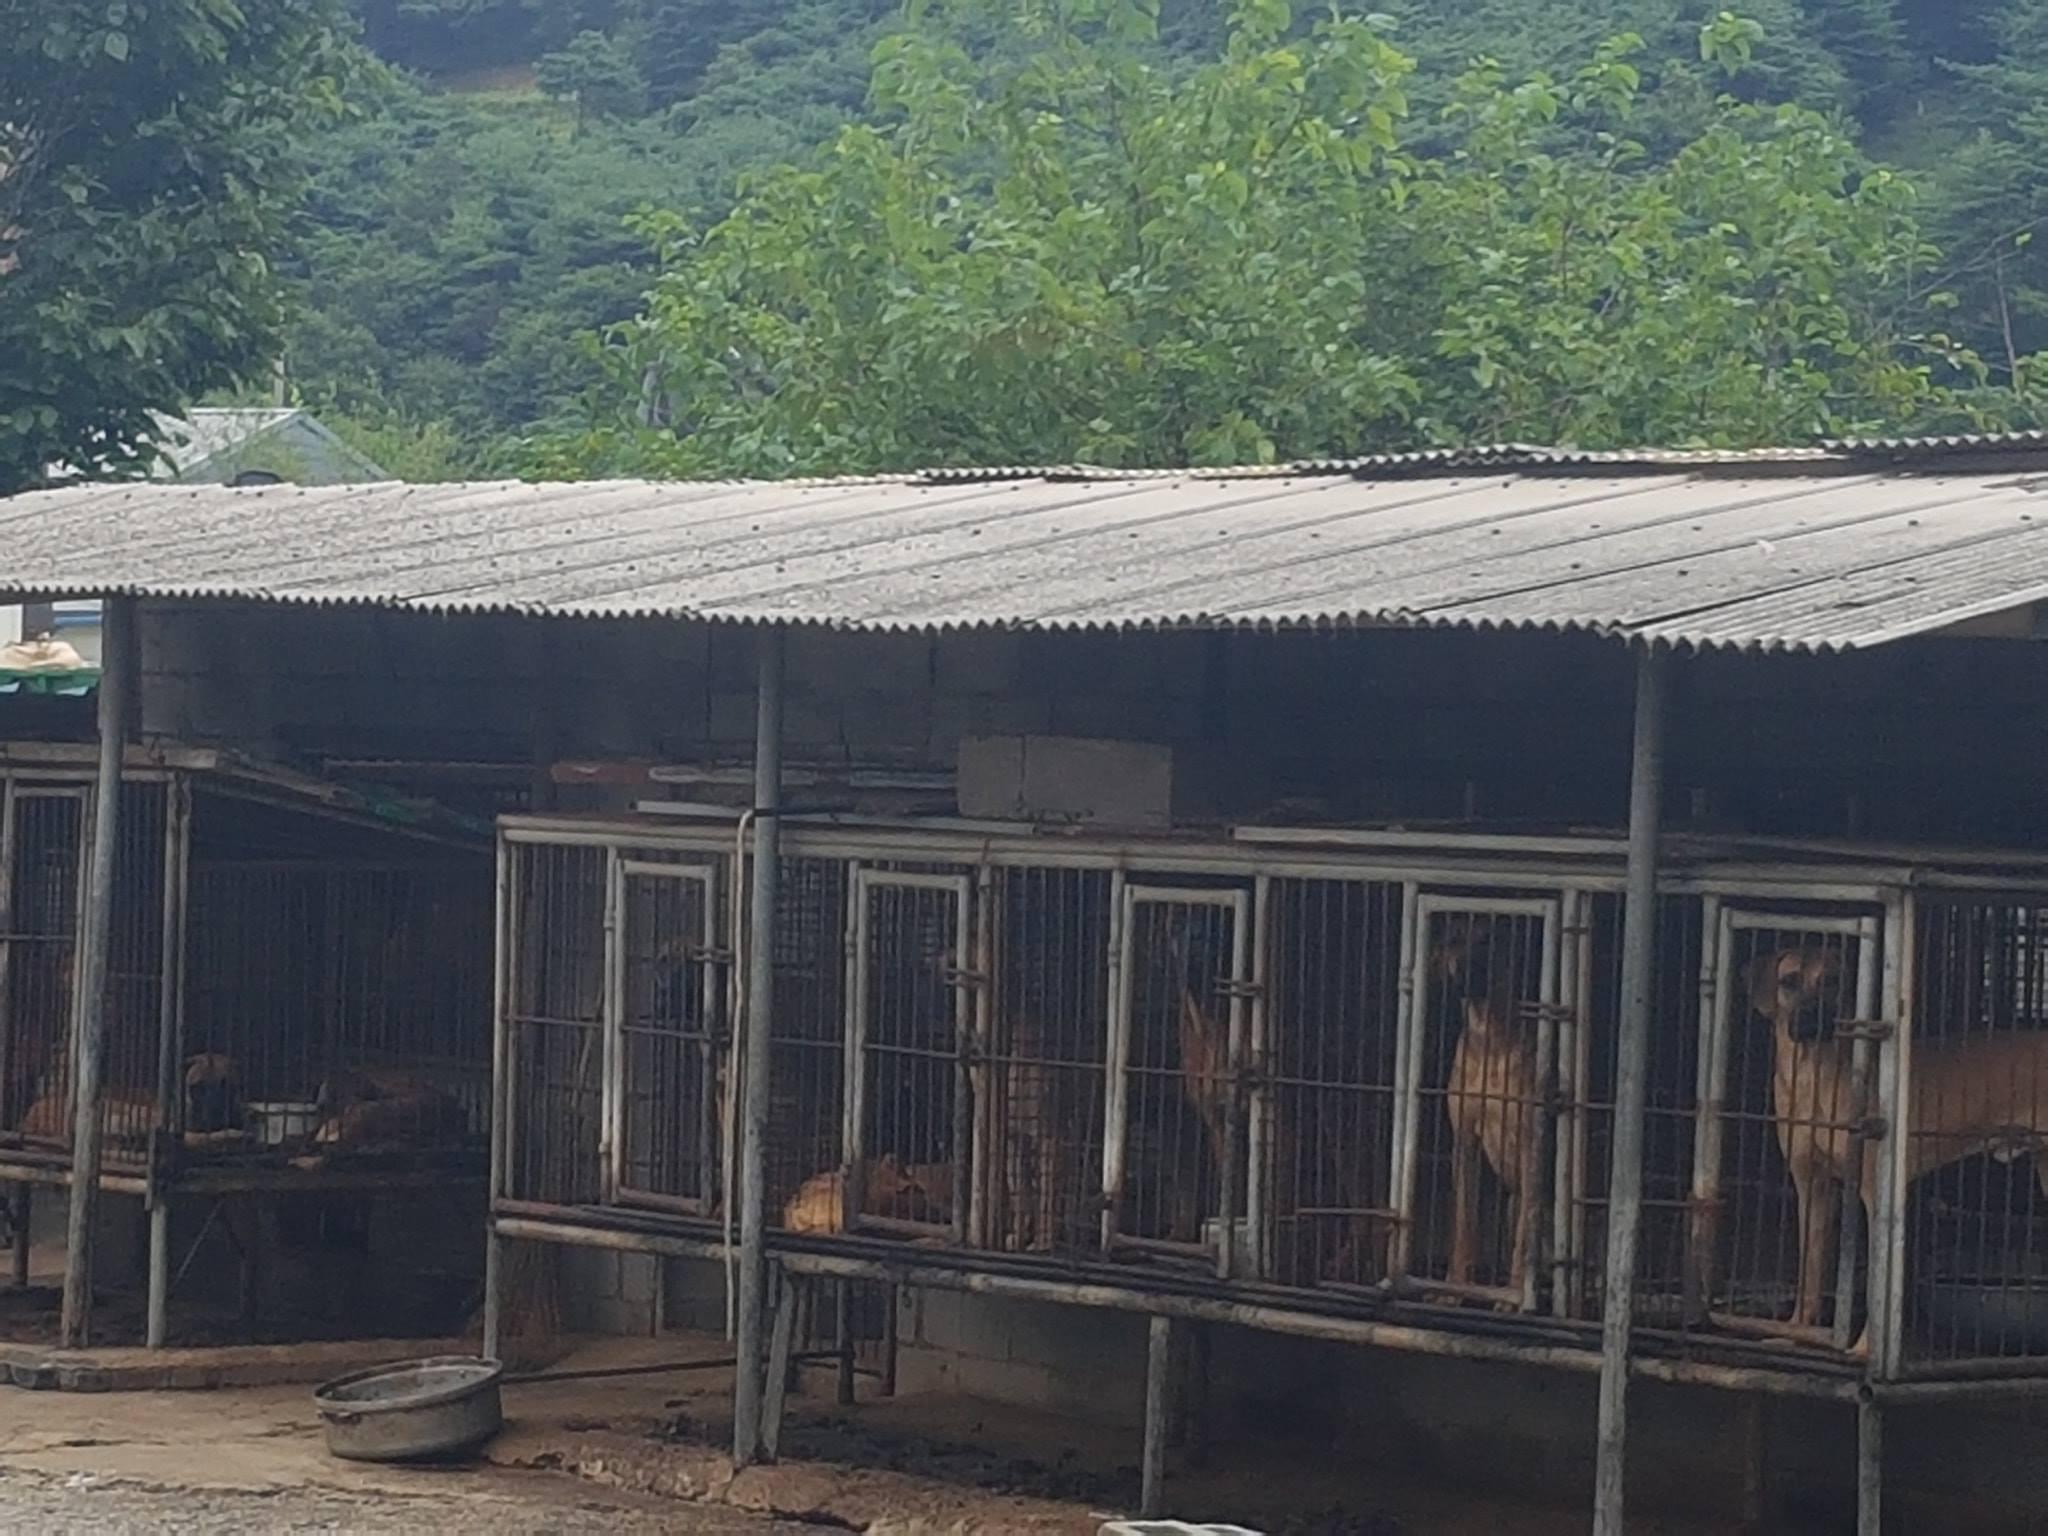 https://www.facebook.com/SaveKoreanDogs/?utm_source=sendinblue&utm_campaign=Your_Actions_Can_Save_Lives!&utm_medium=email